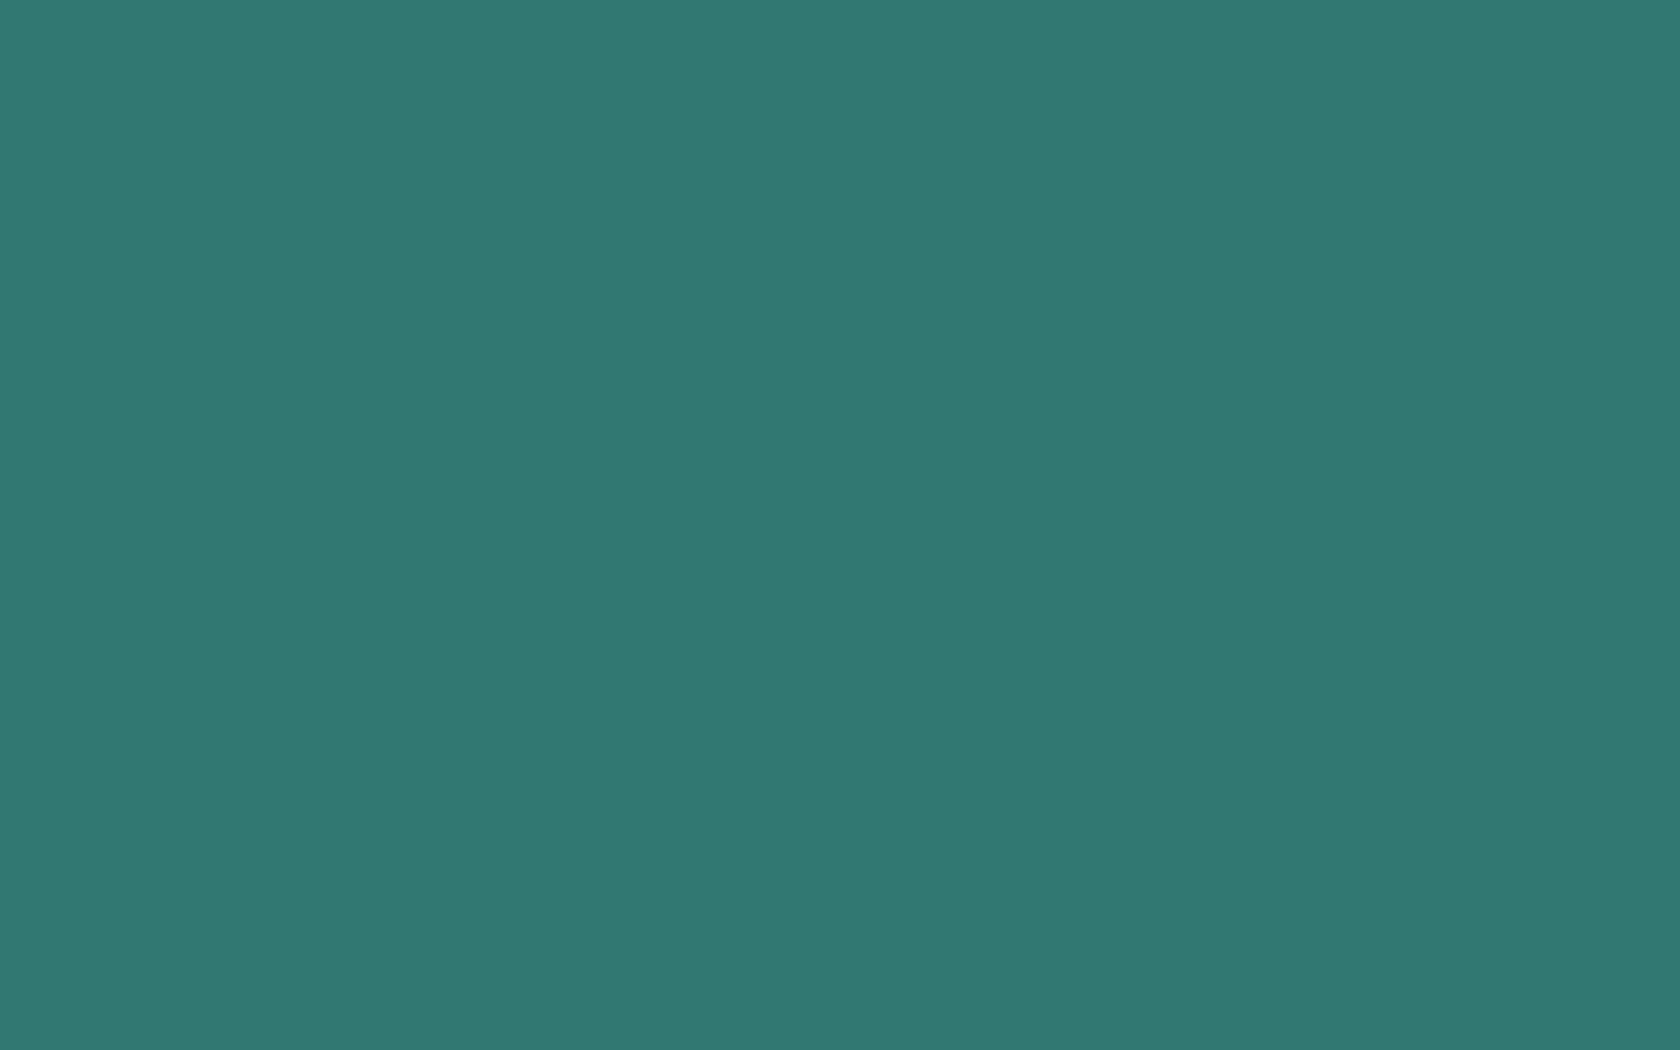 1680x1050 Myrtle Green Solid Color Background